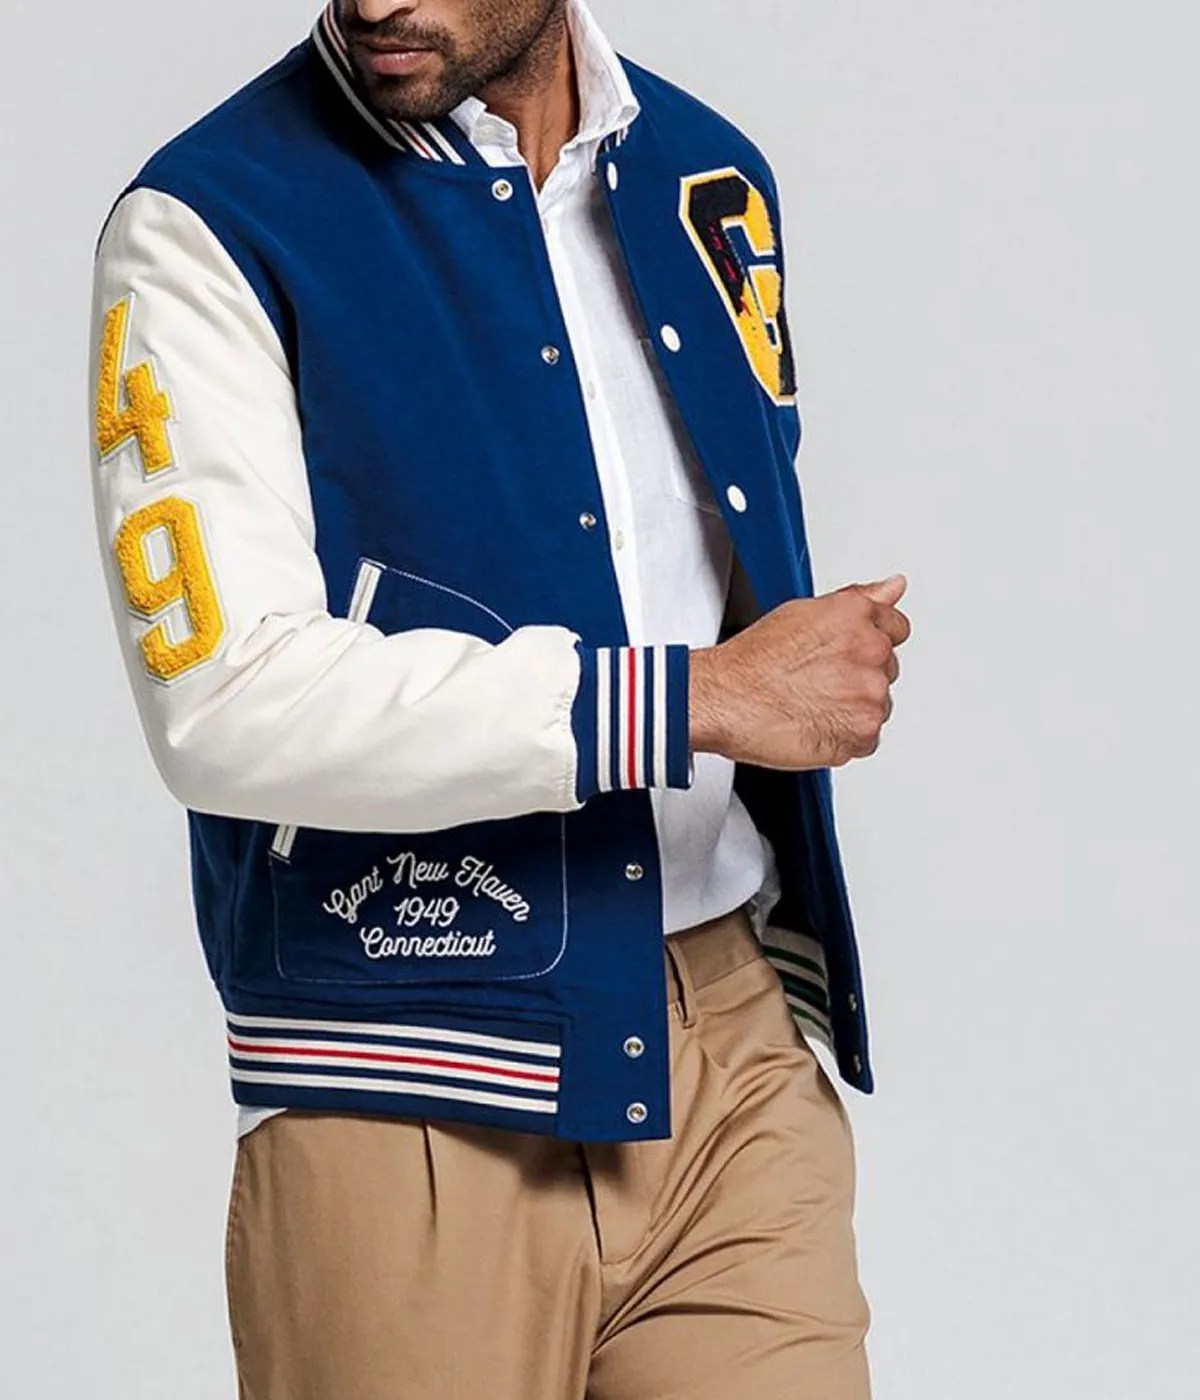 gant-the-gant-spring-letterman-jacket